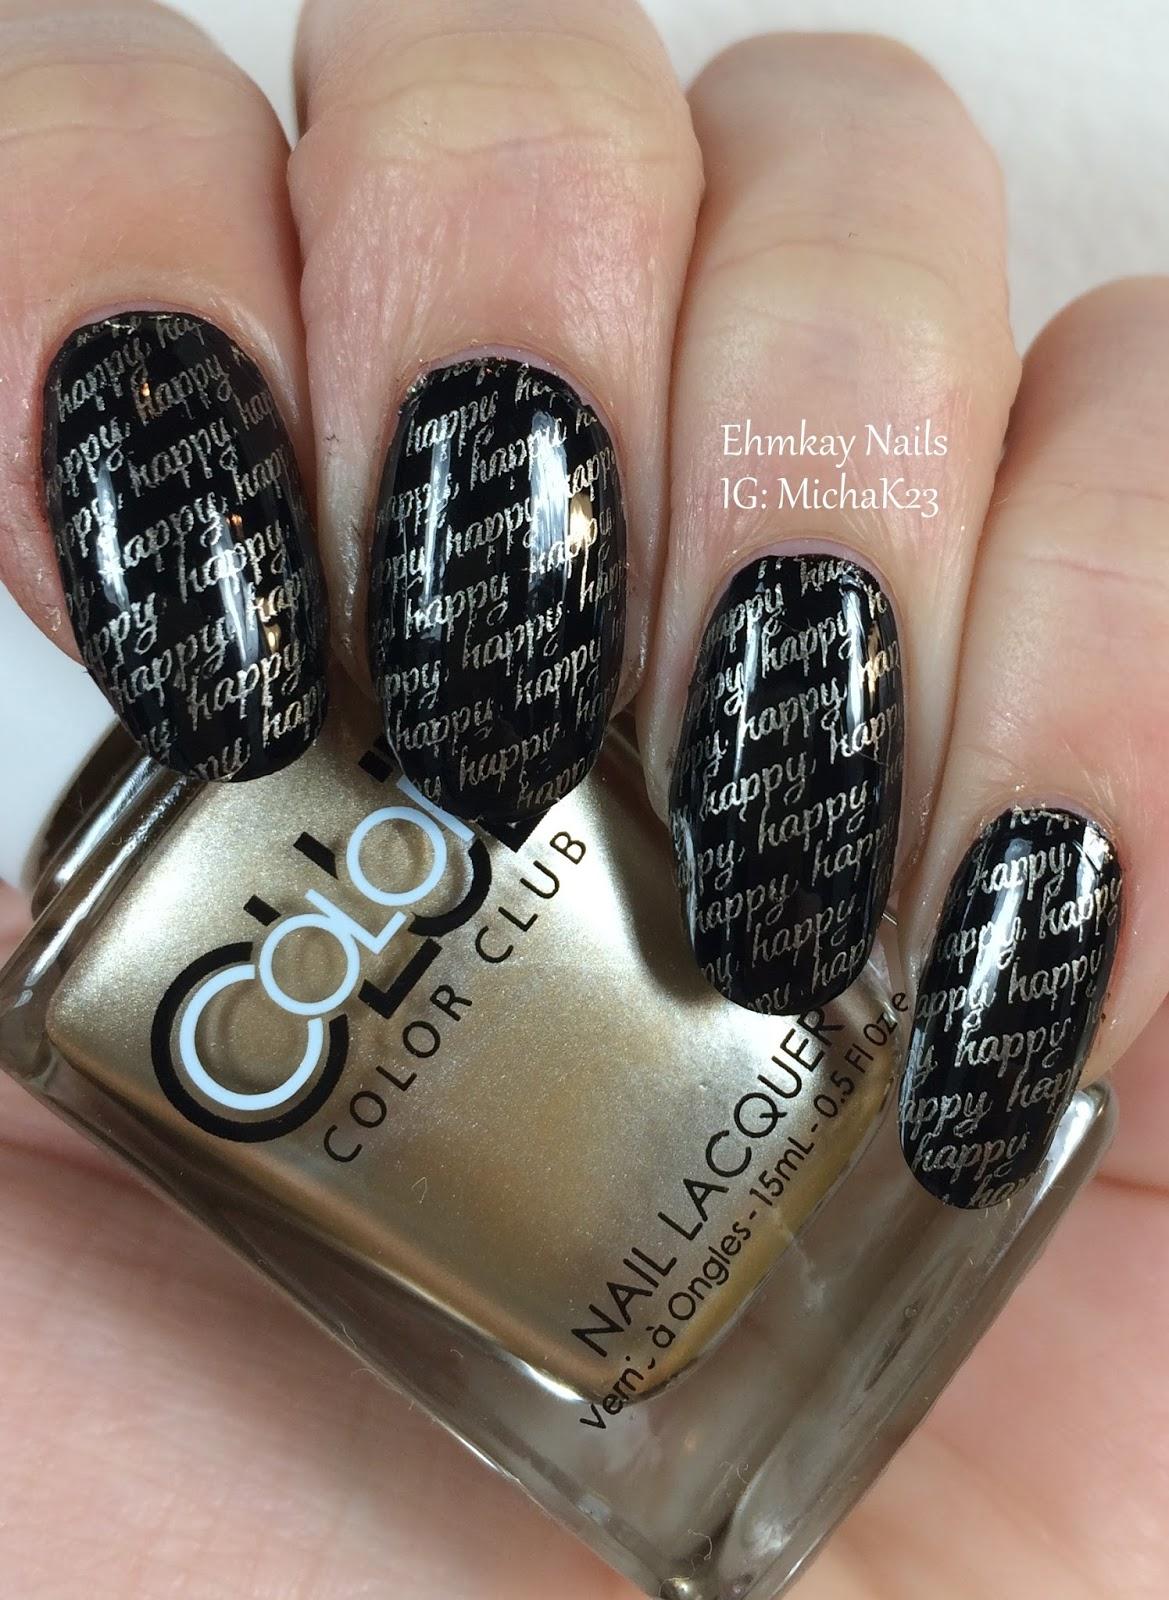 ehmkay nails: Happy New Year\'s Eve Nail Art Stamping